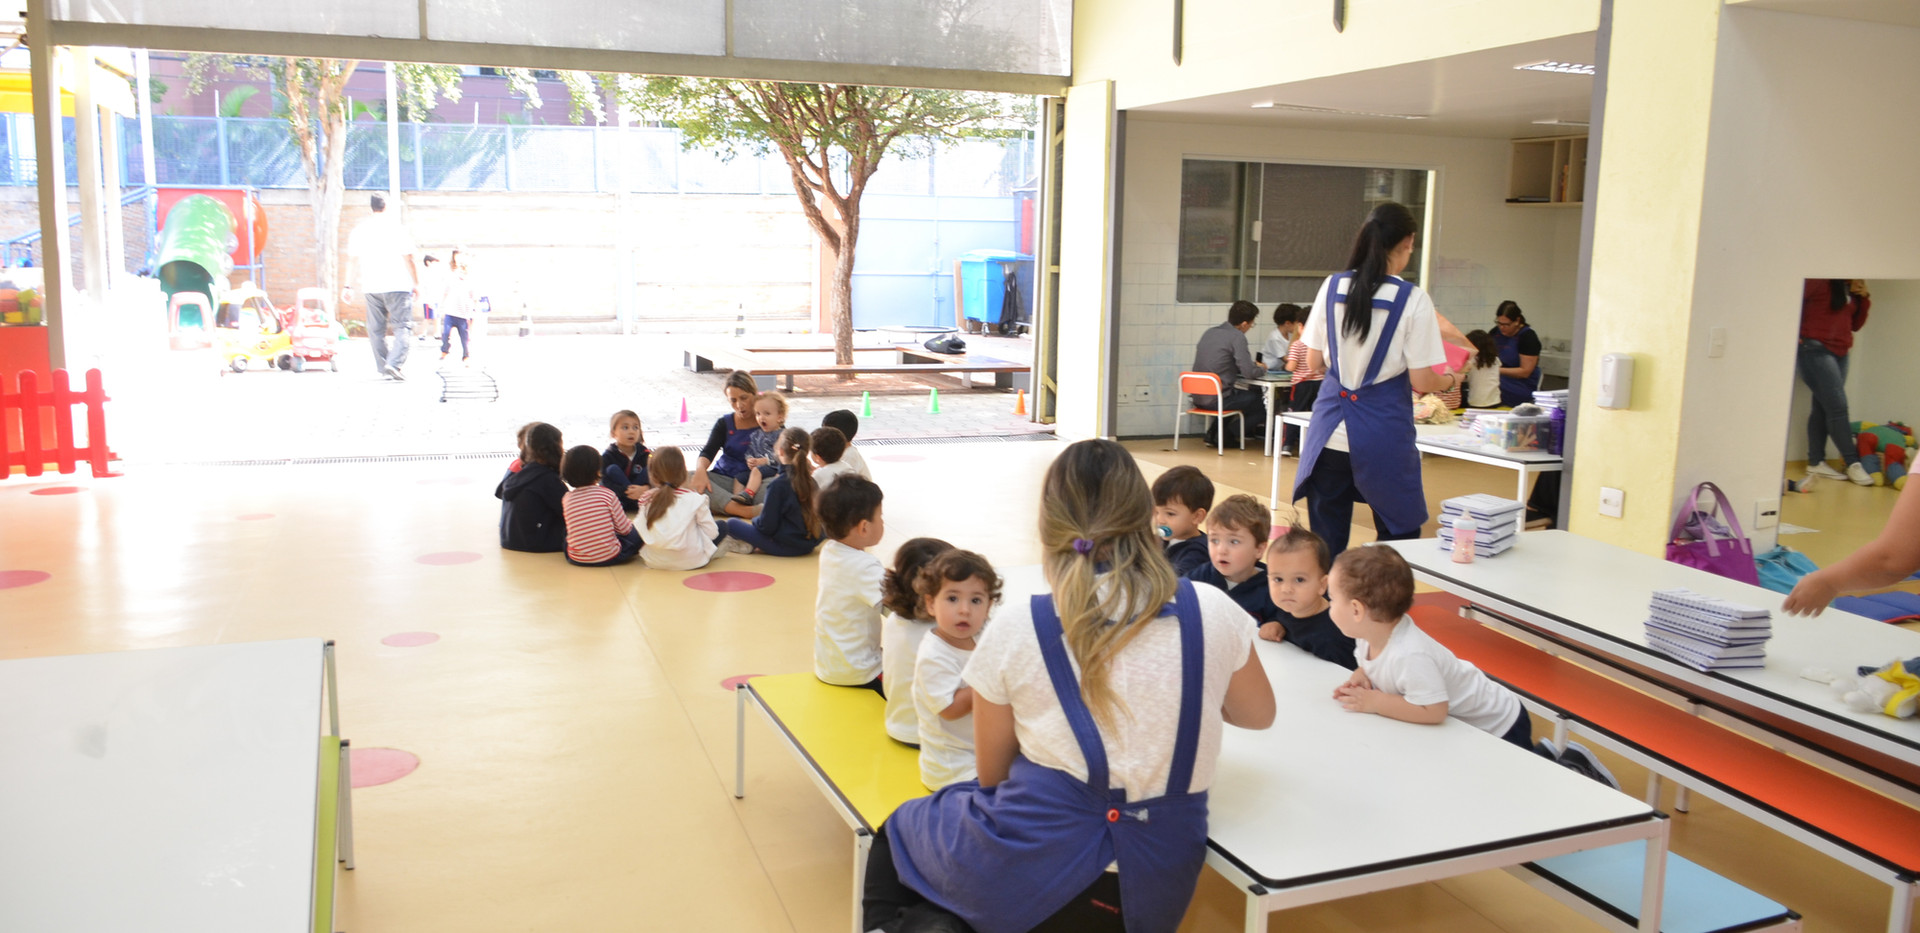 escola-infantil-moema-15.JPG